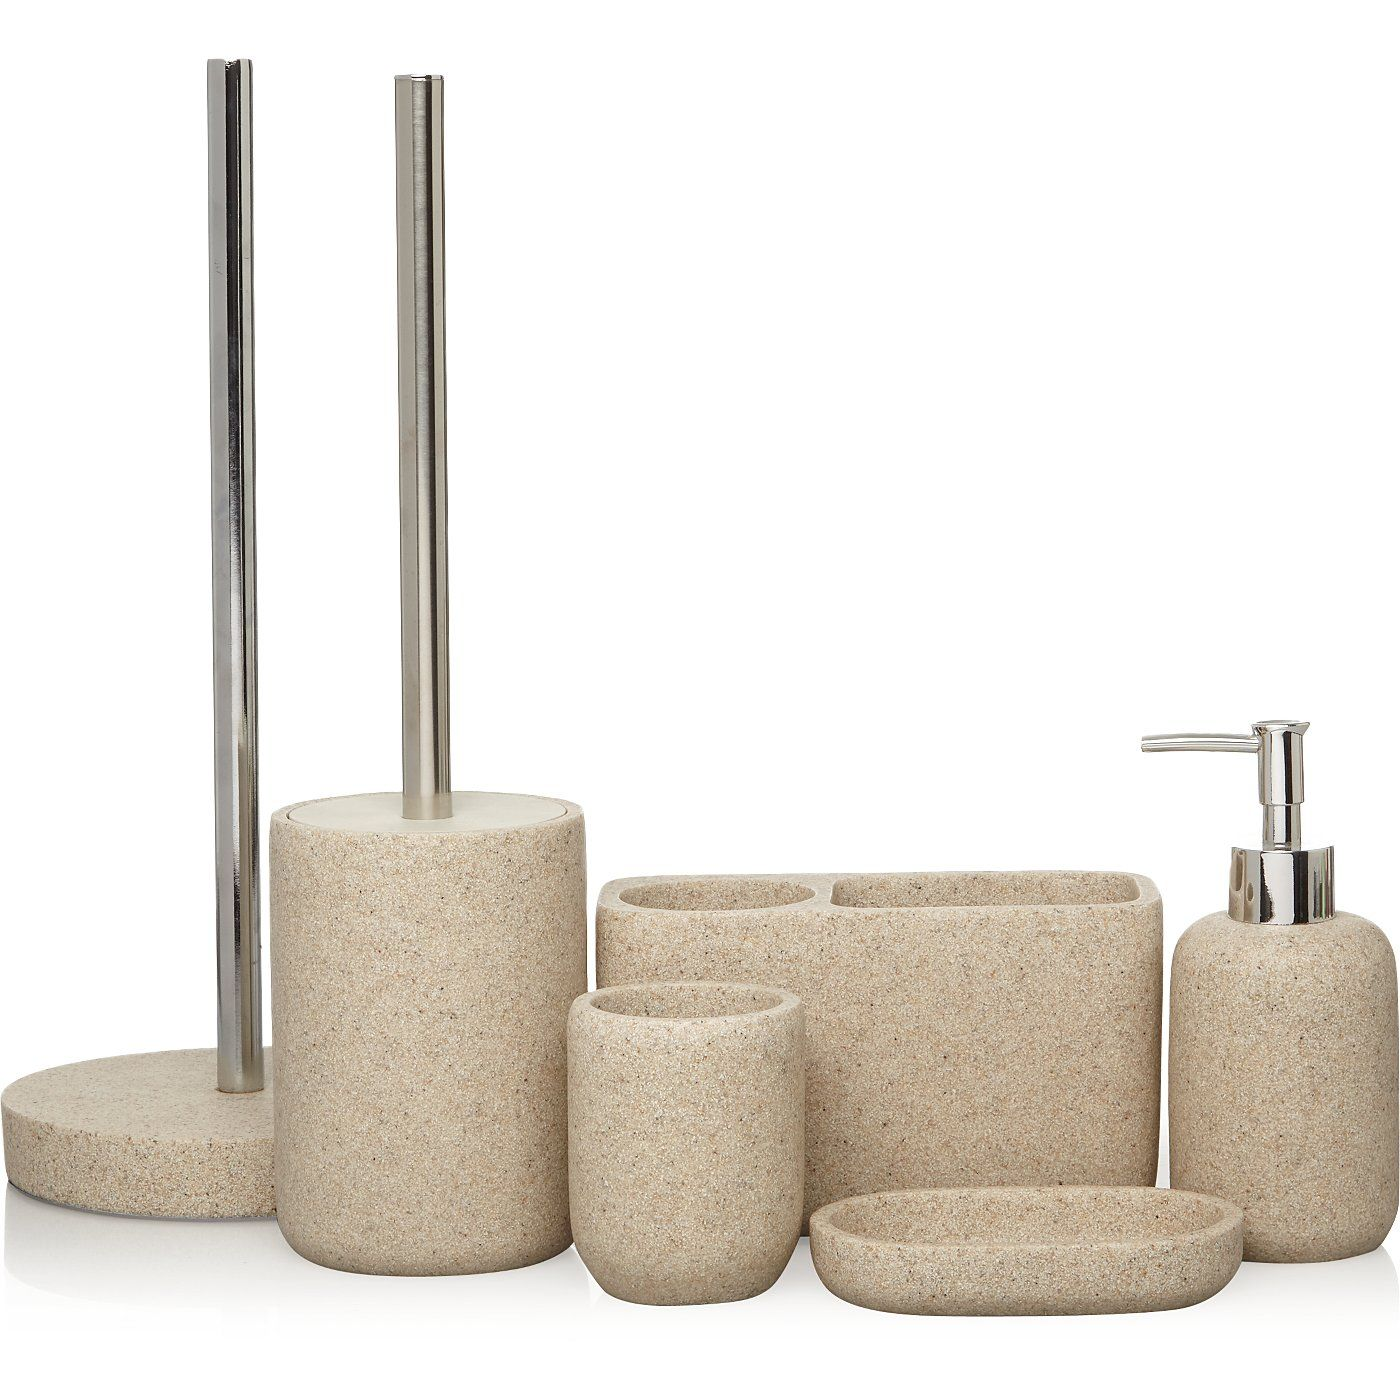 Sandstone Soap Dispenser | Bathroom | Pinterest | Bath accessories ...